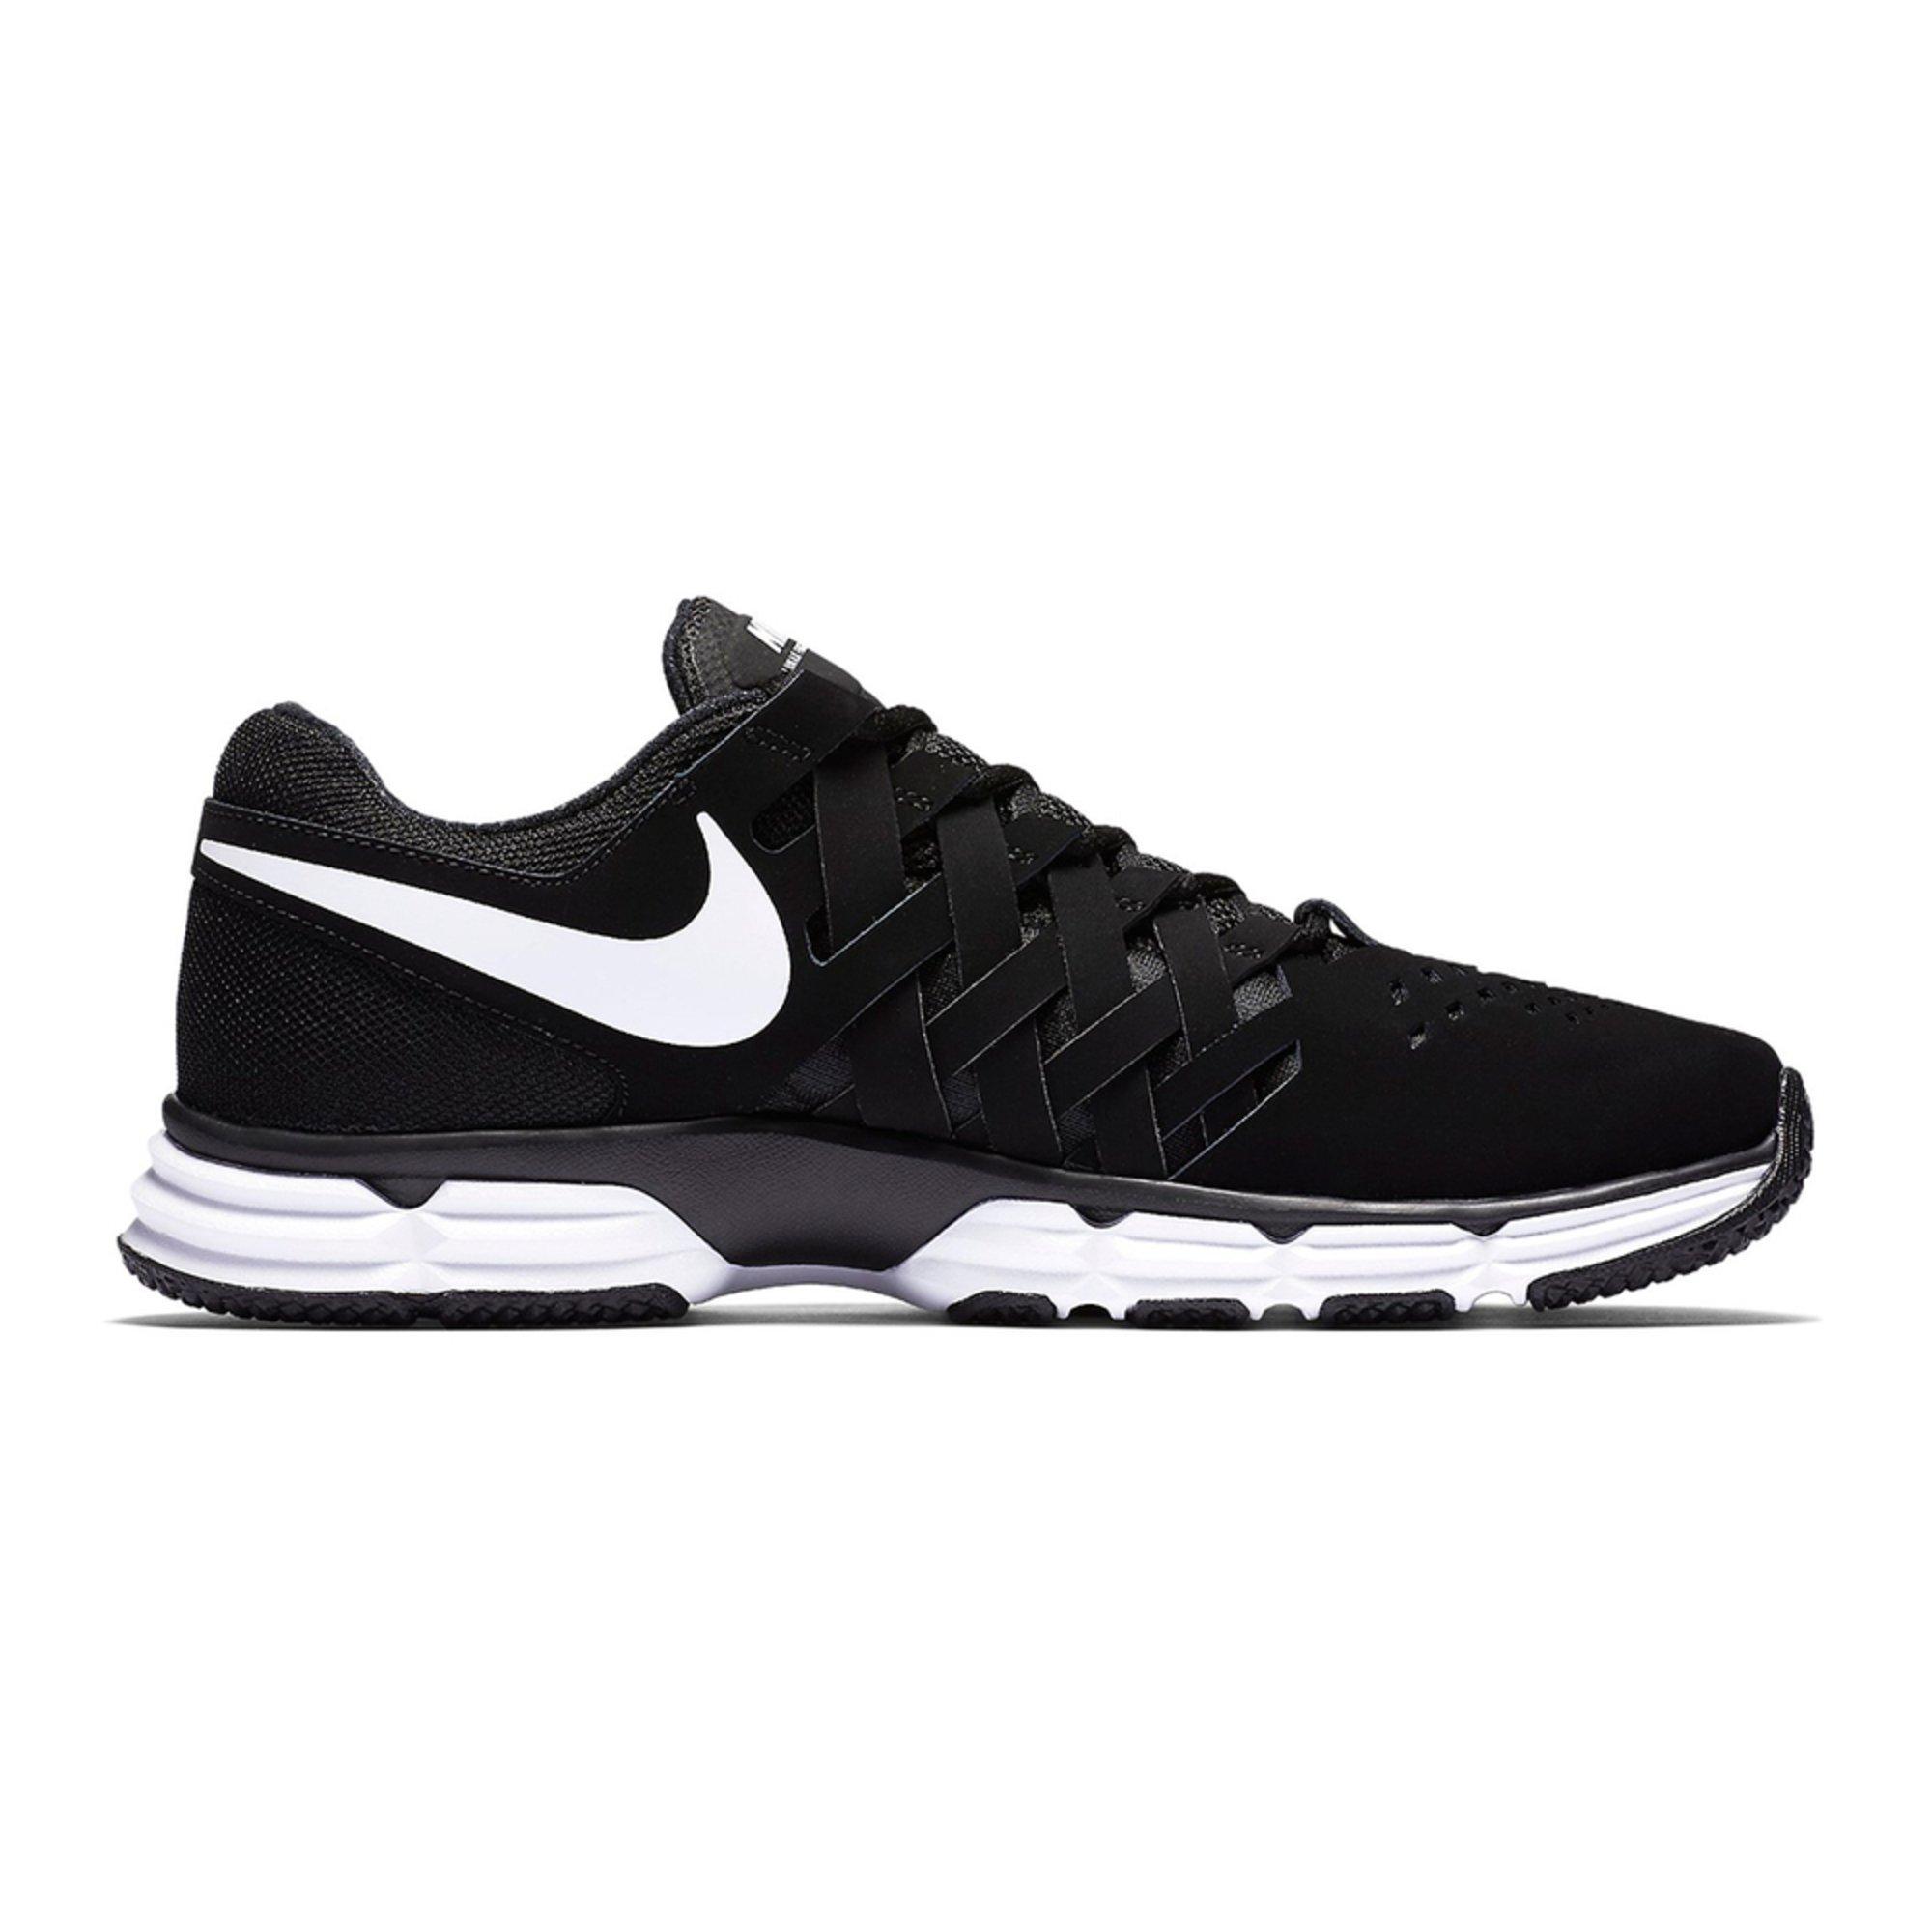 b09d79992175 Nike Men s Lunar Fingertrap Training Shoe